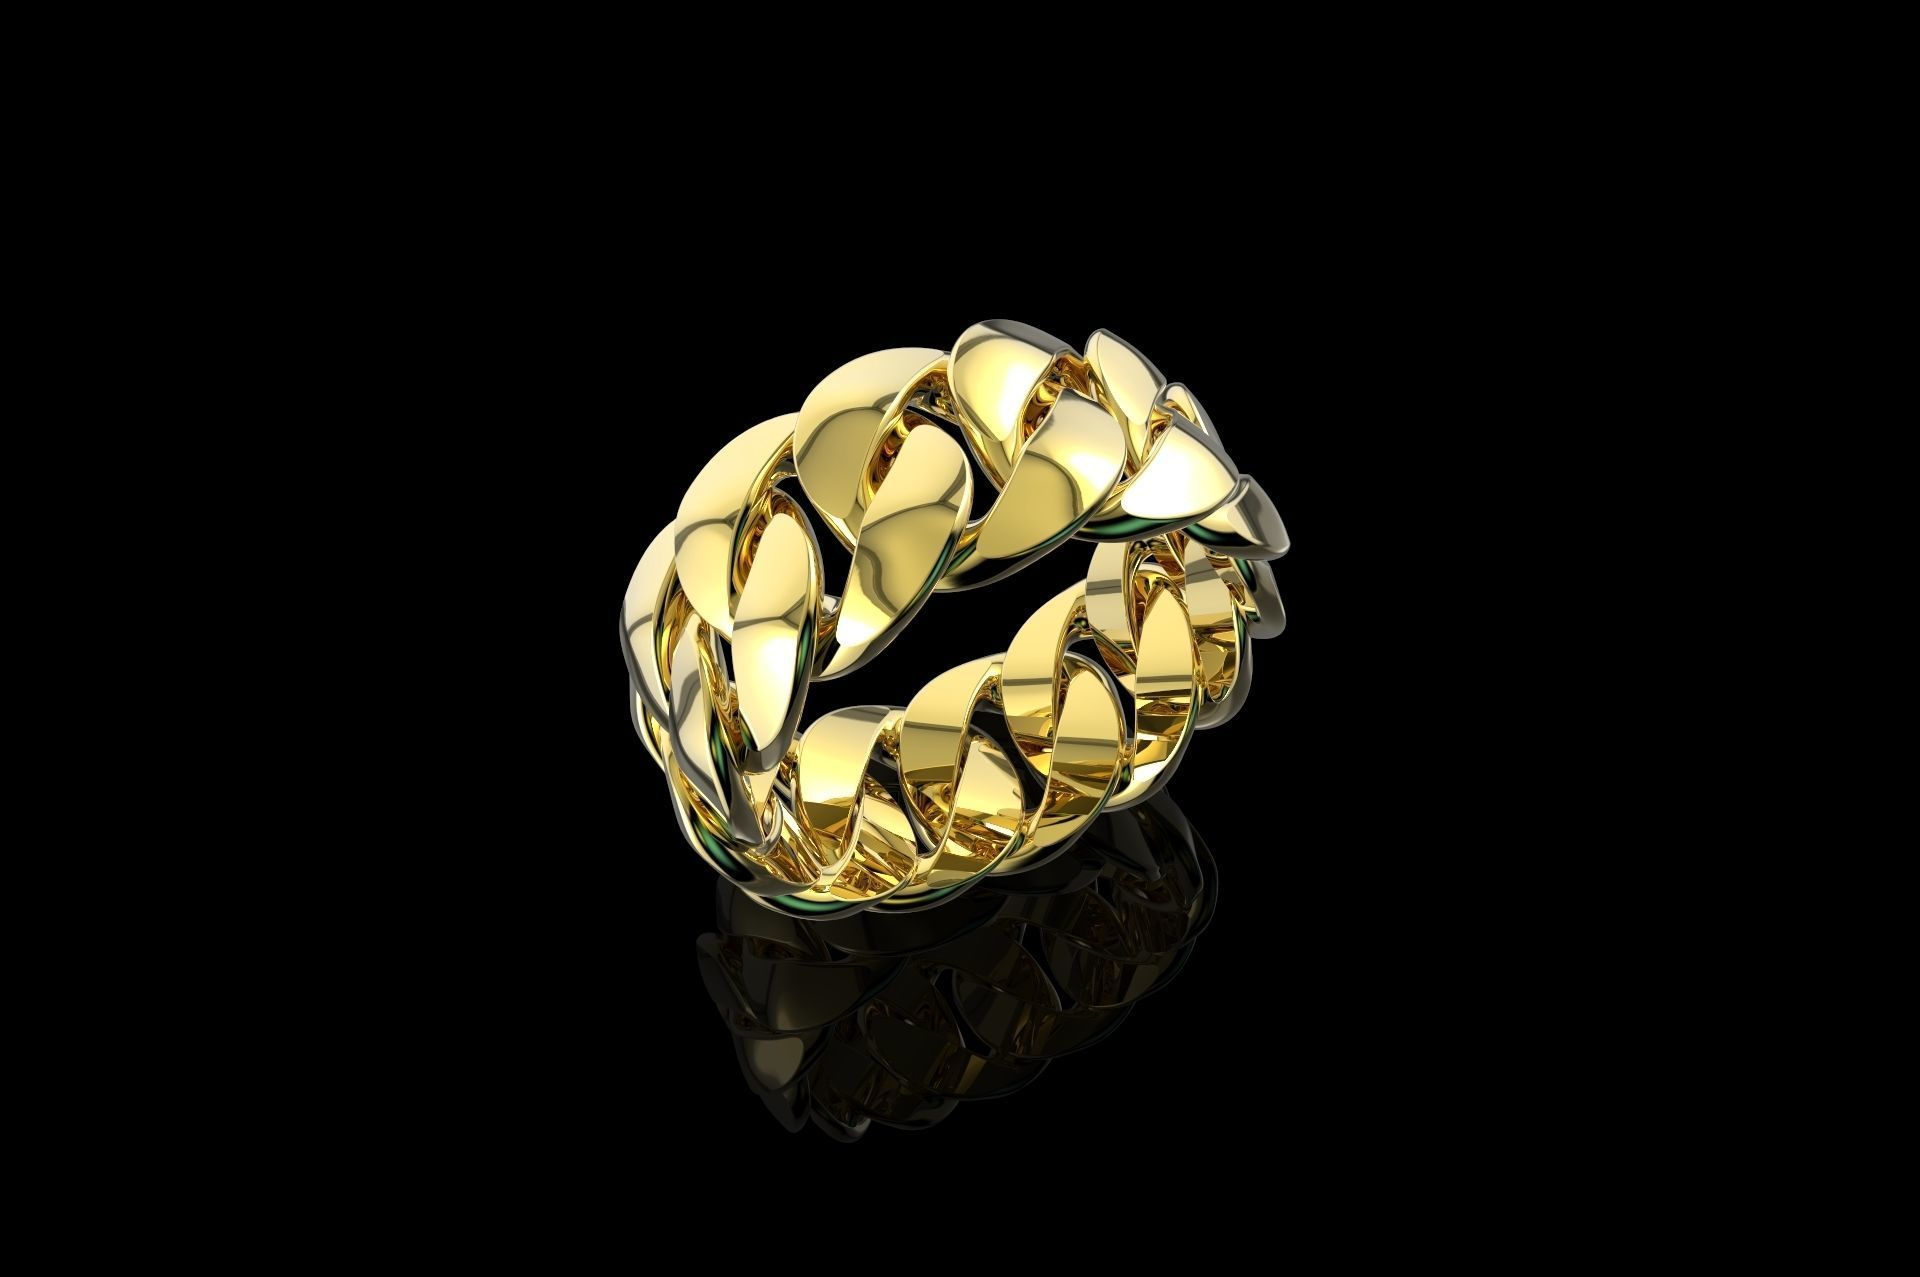 Gold N795